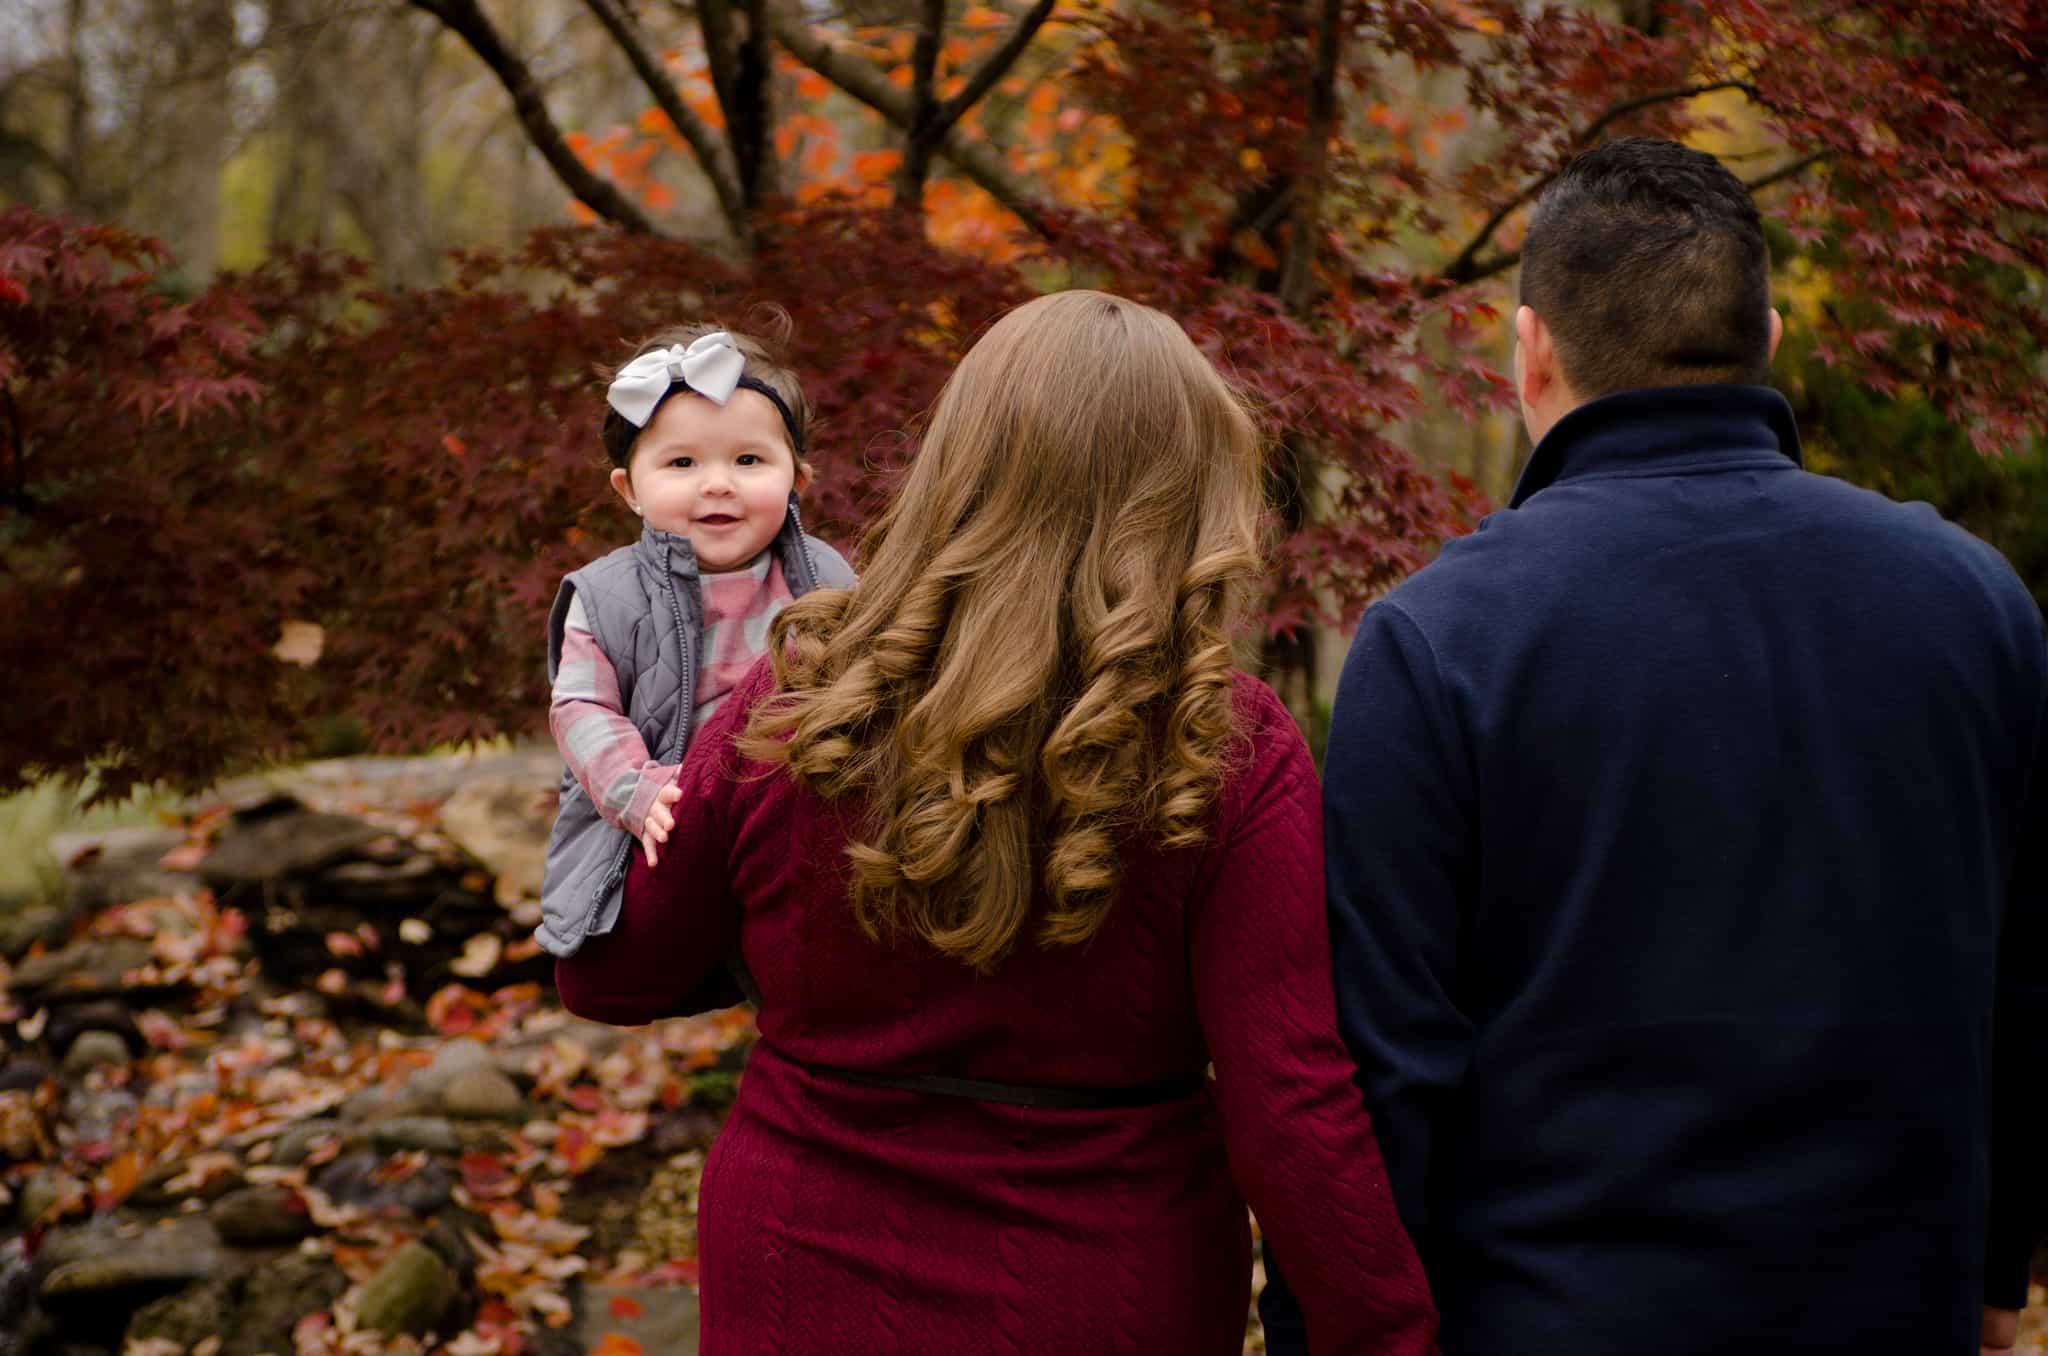 Autumn foliage, fall colors, toddler, white bow